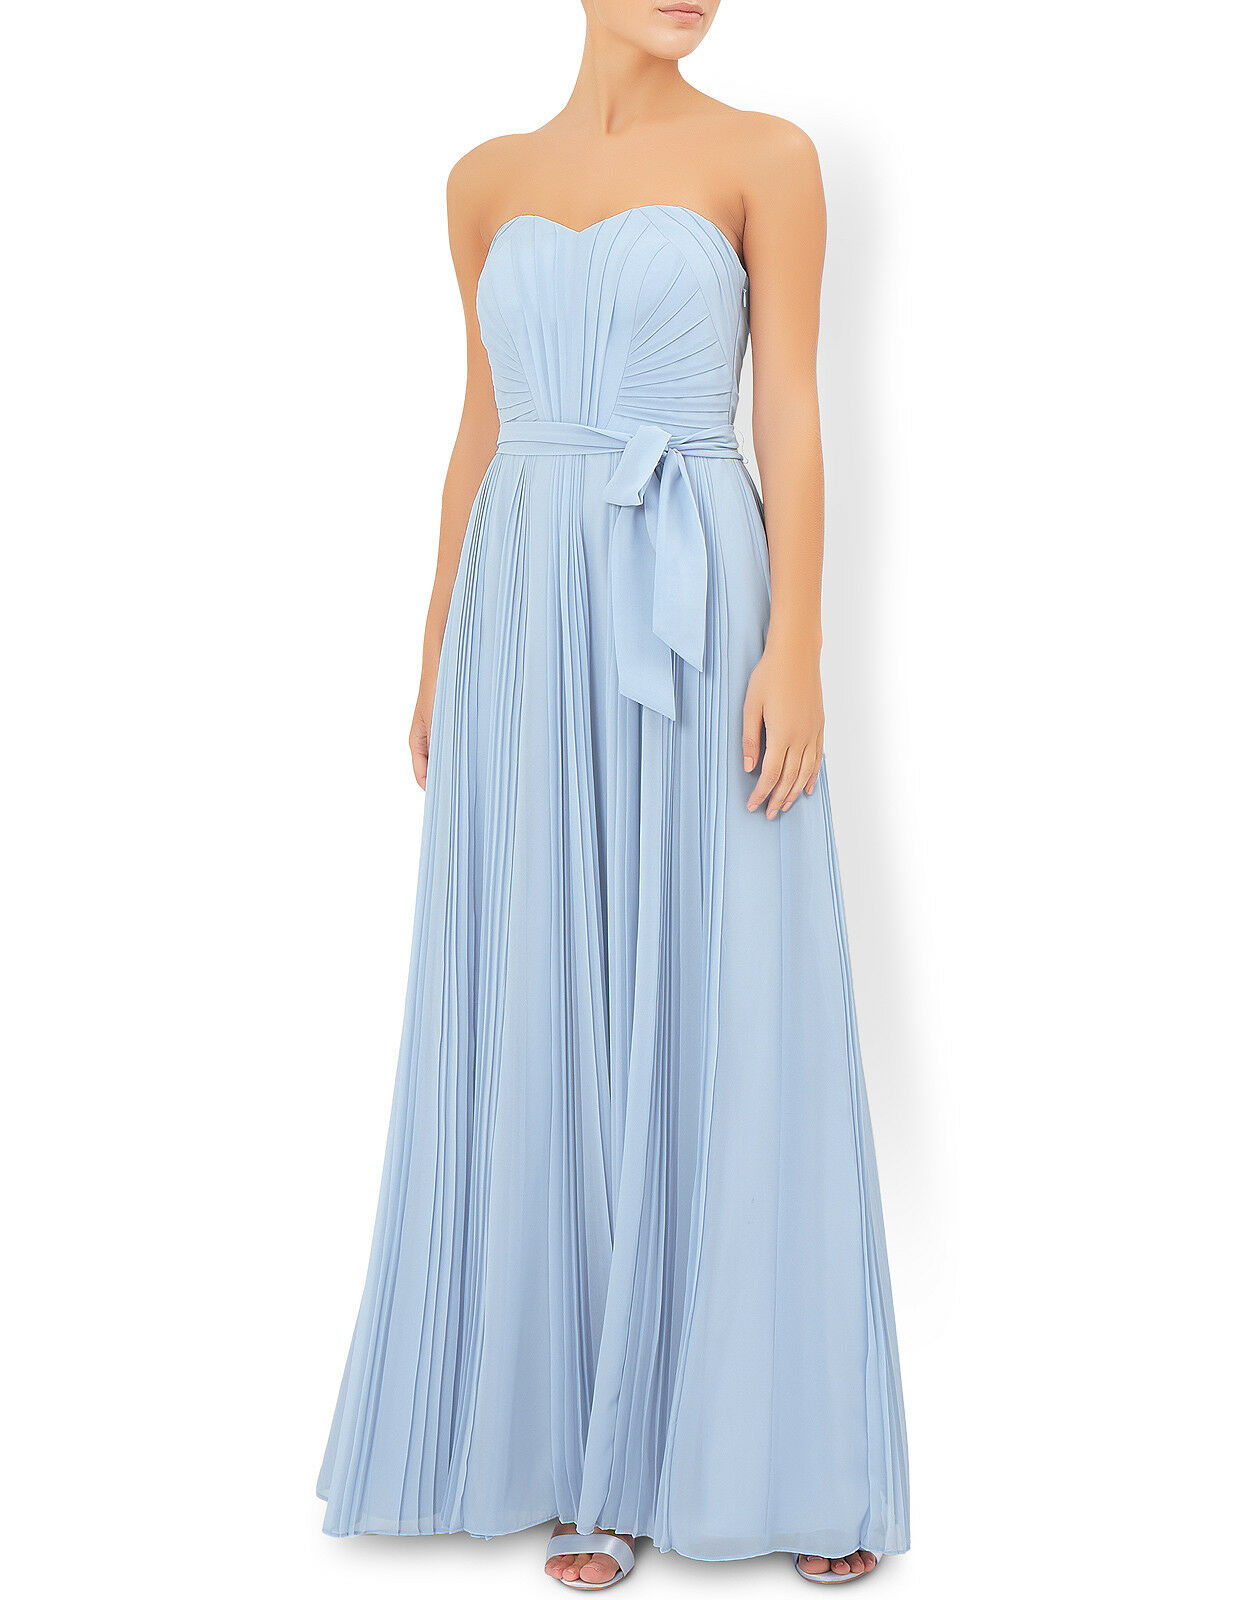 rotUCED   BNWT  MONSOON  Blau MAXI DRESS Größe  12  RRP